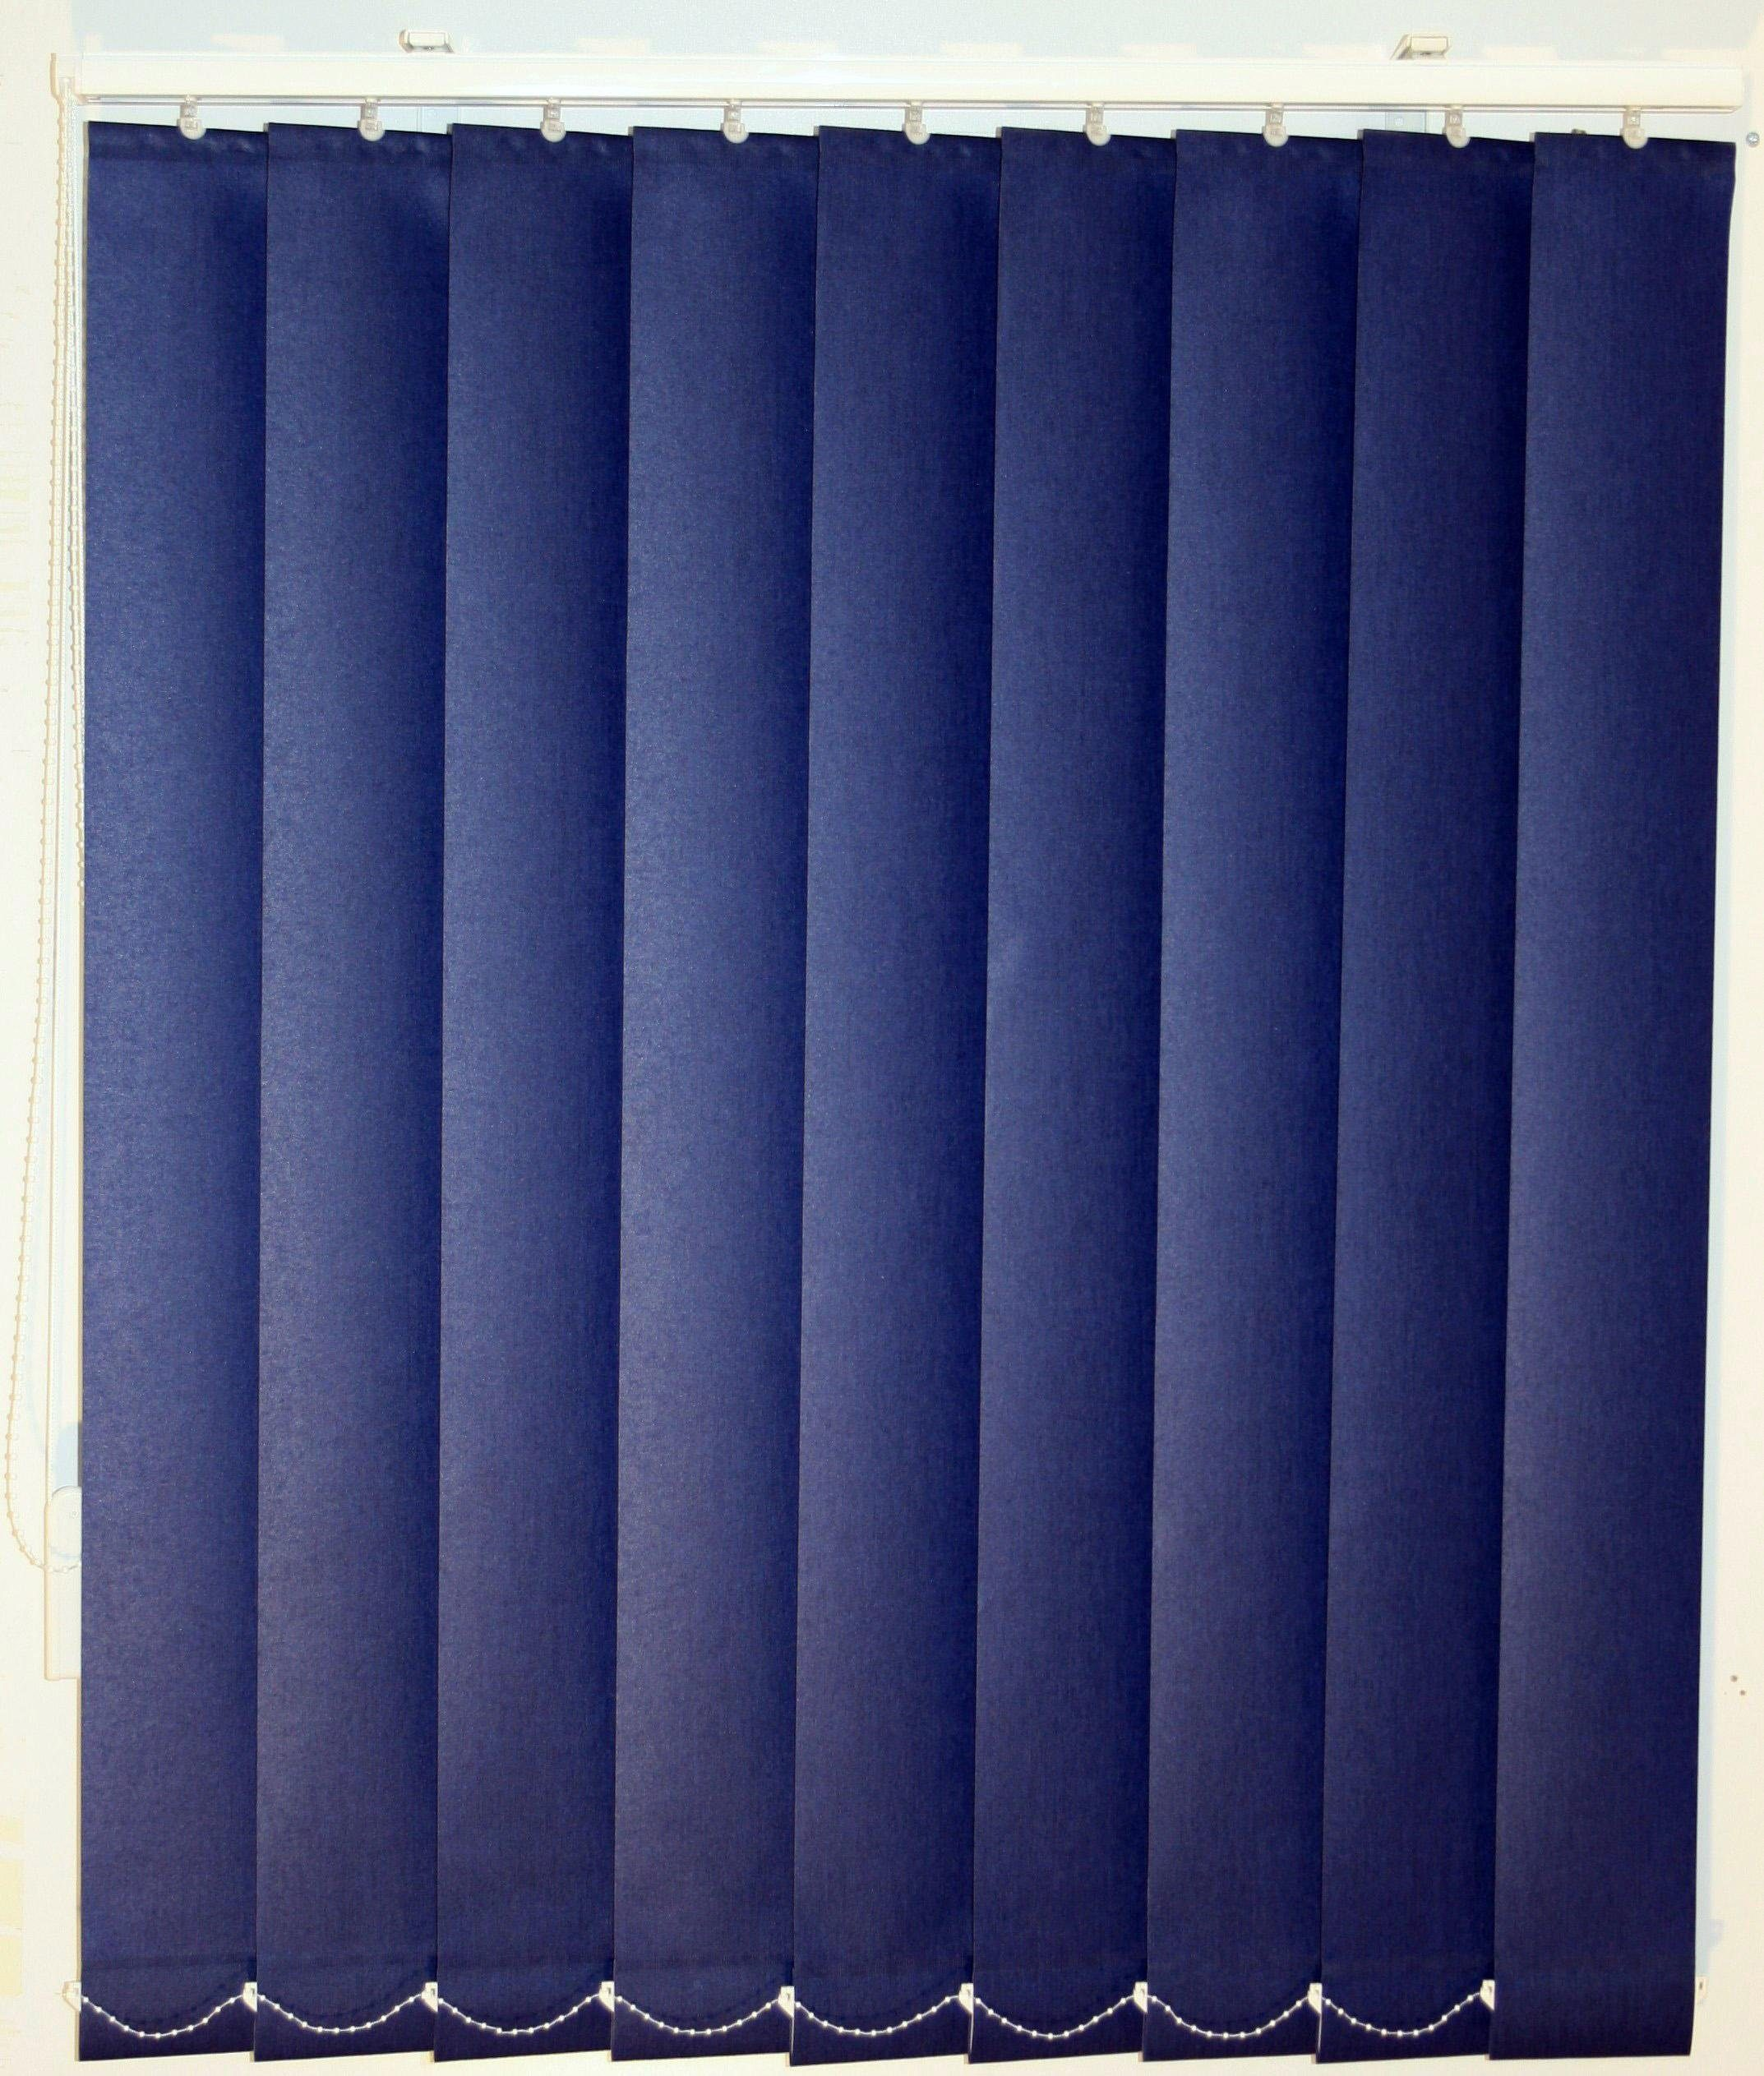 Vertikal-Lamellenvorhang, Sunlines, im Wunschmaß